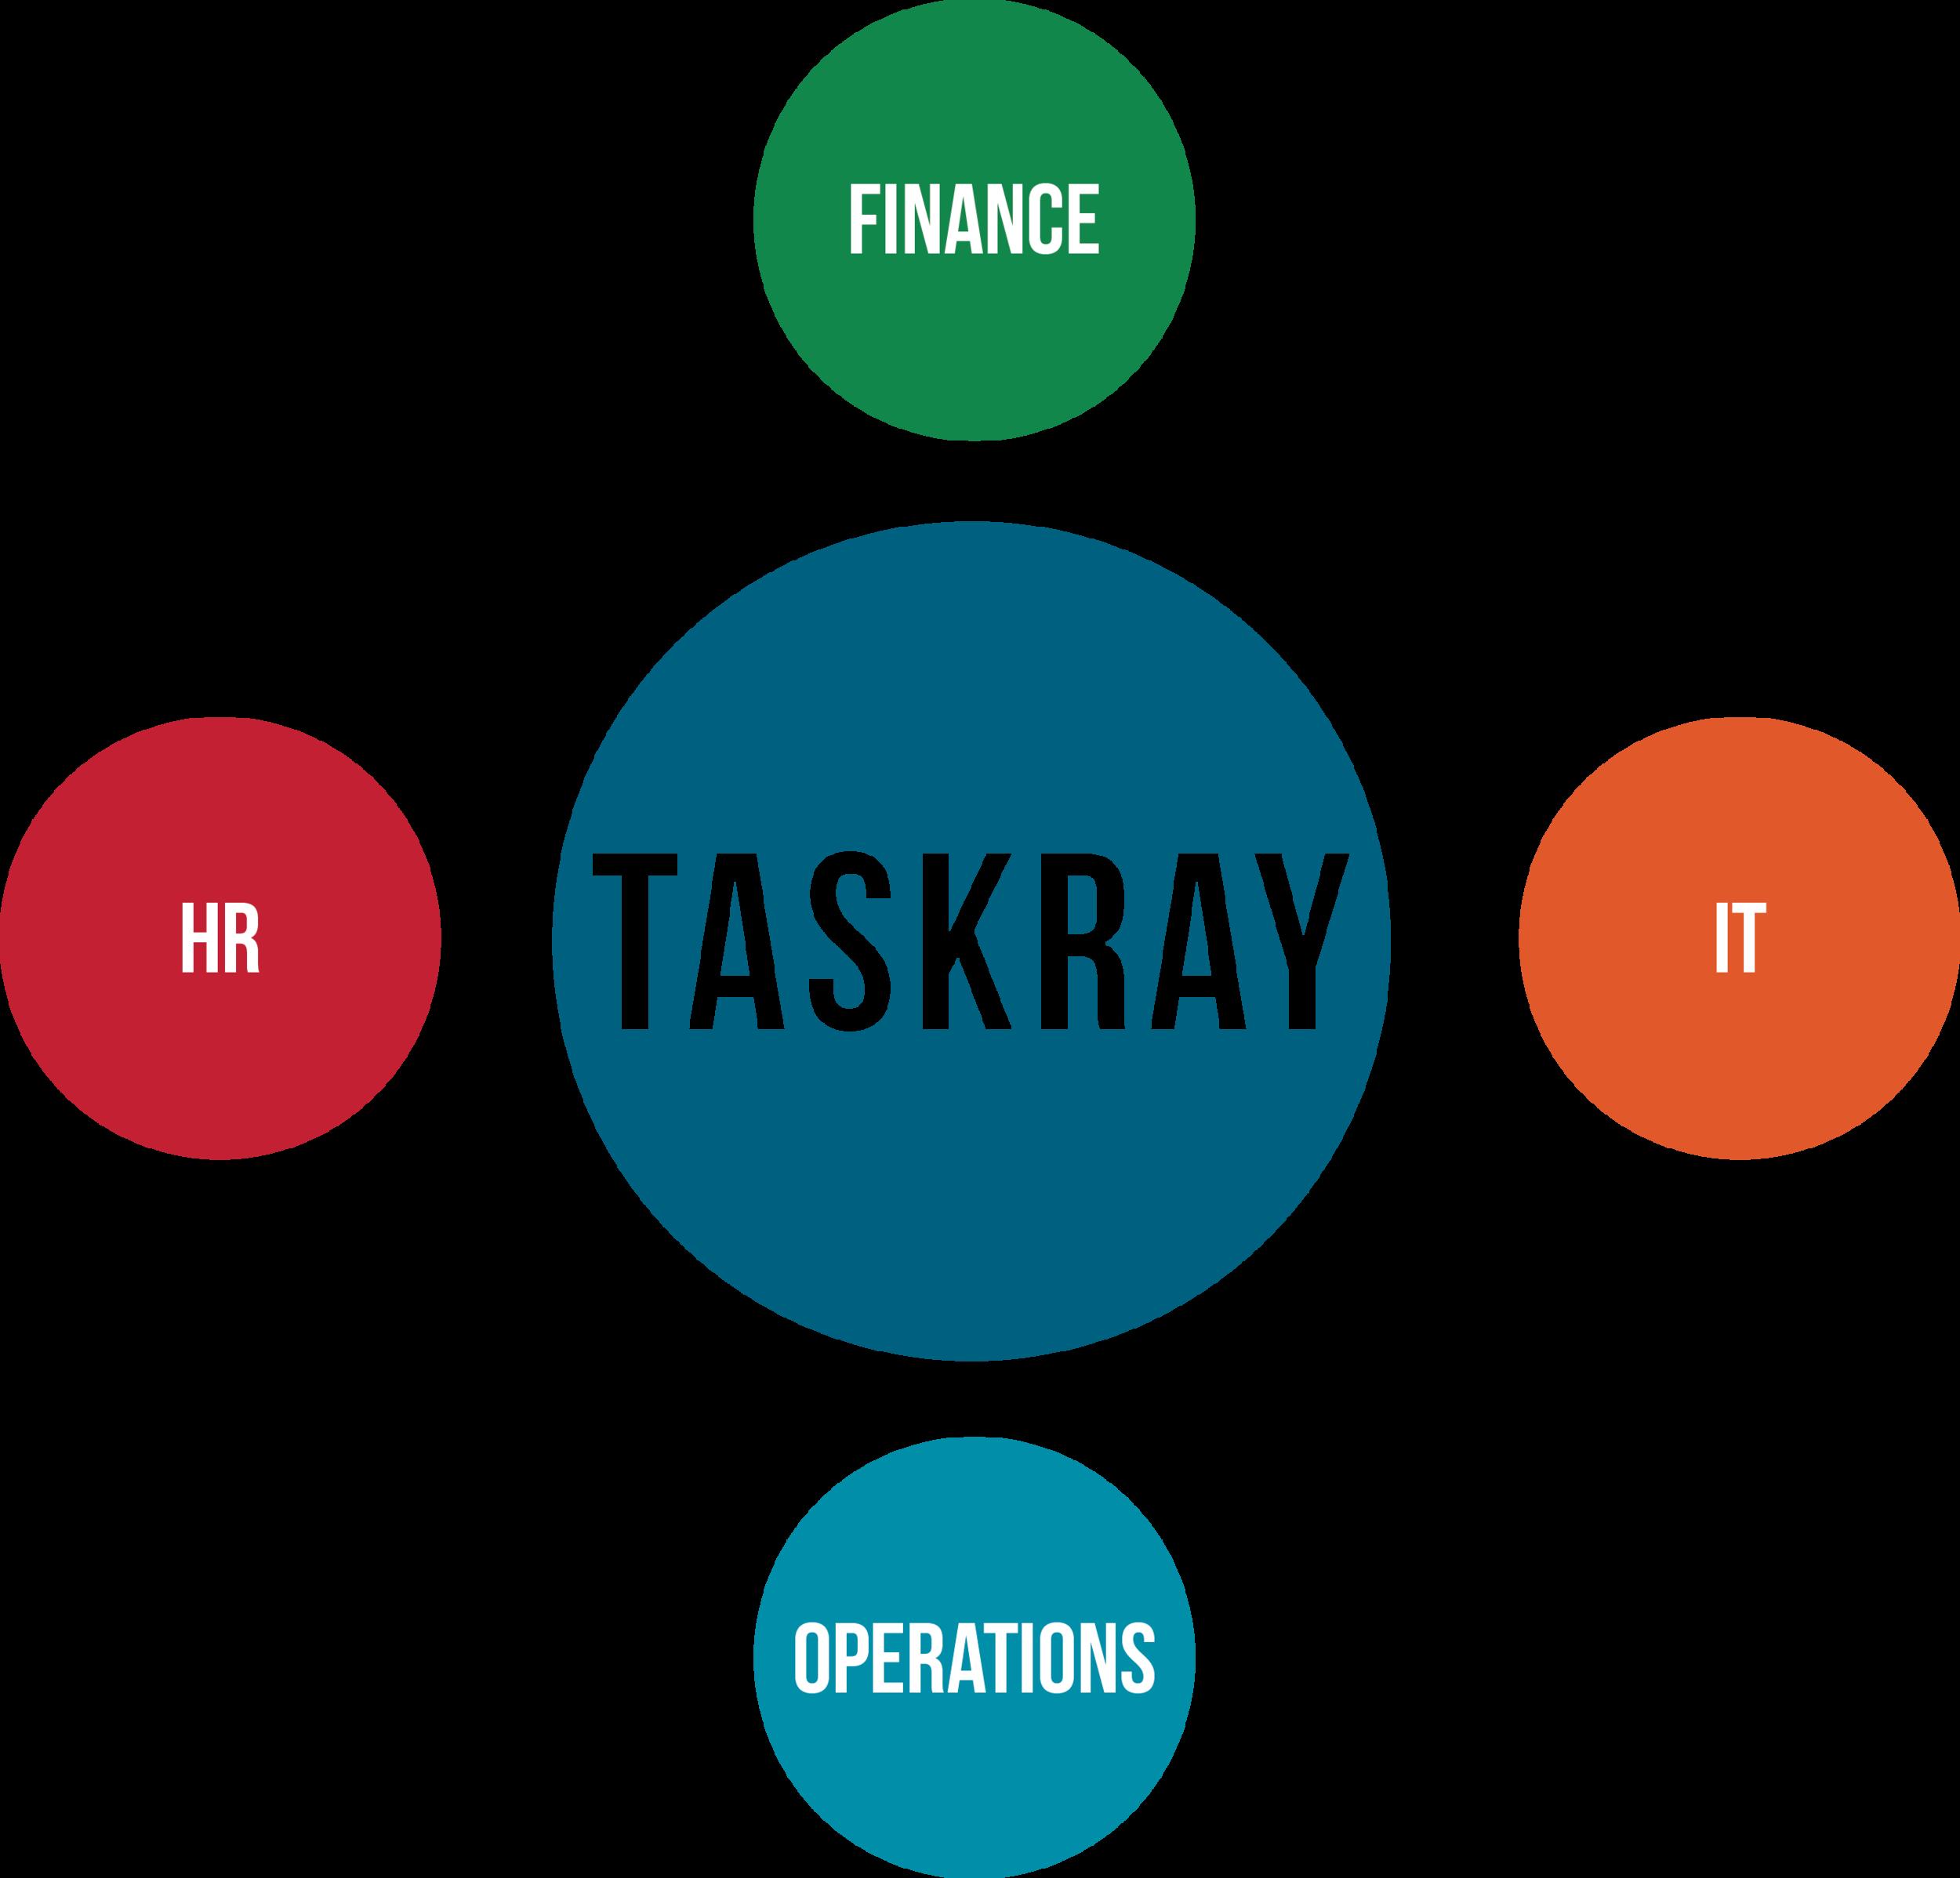 taskray-back-office-graphic-02.png